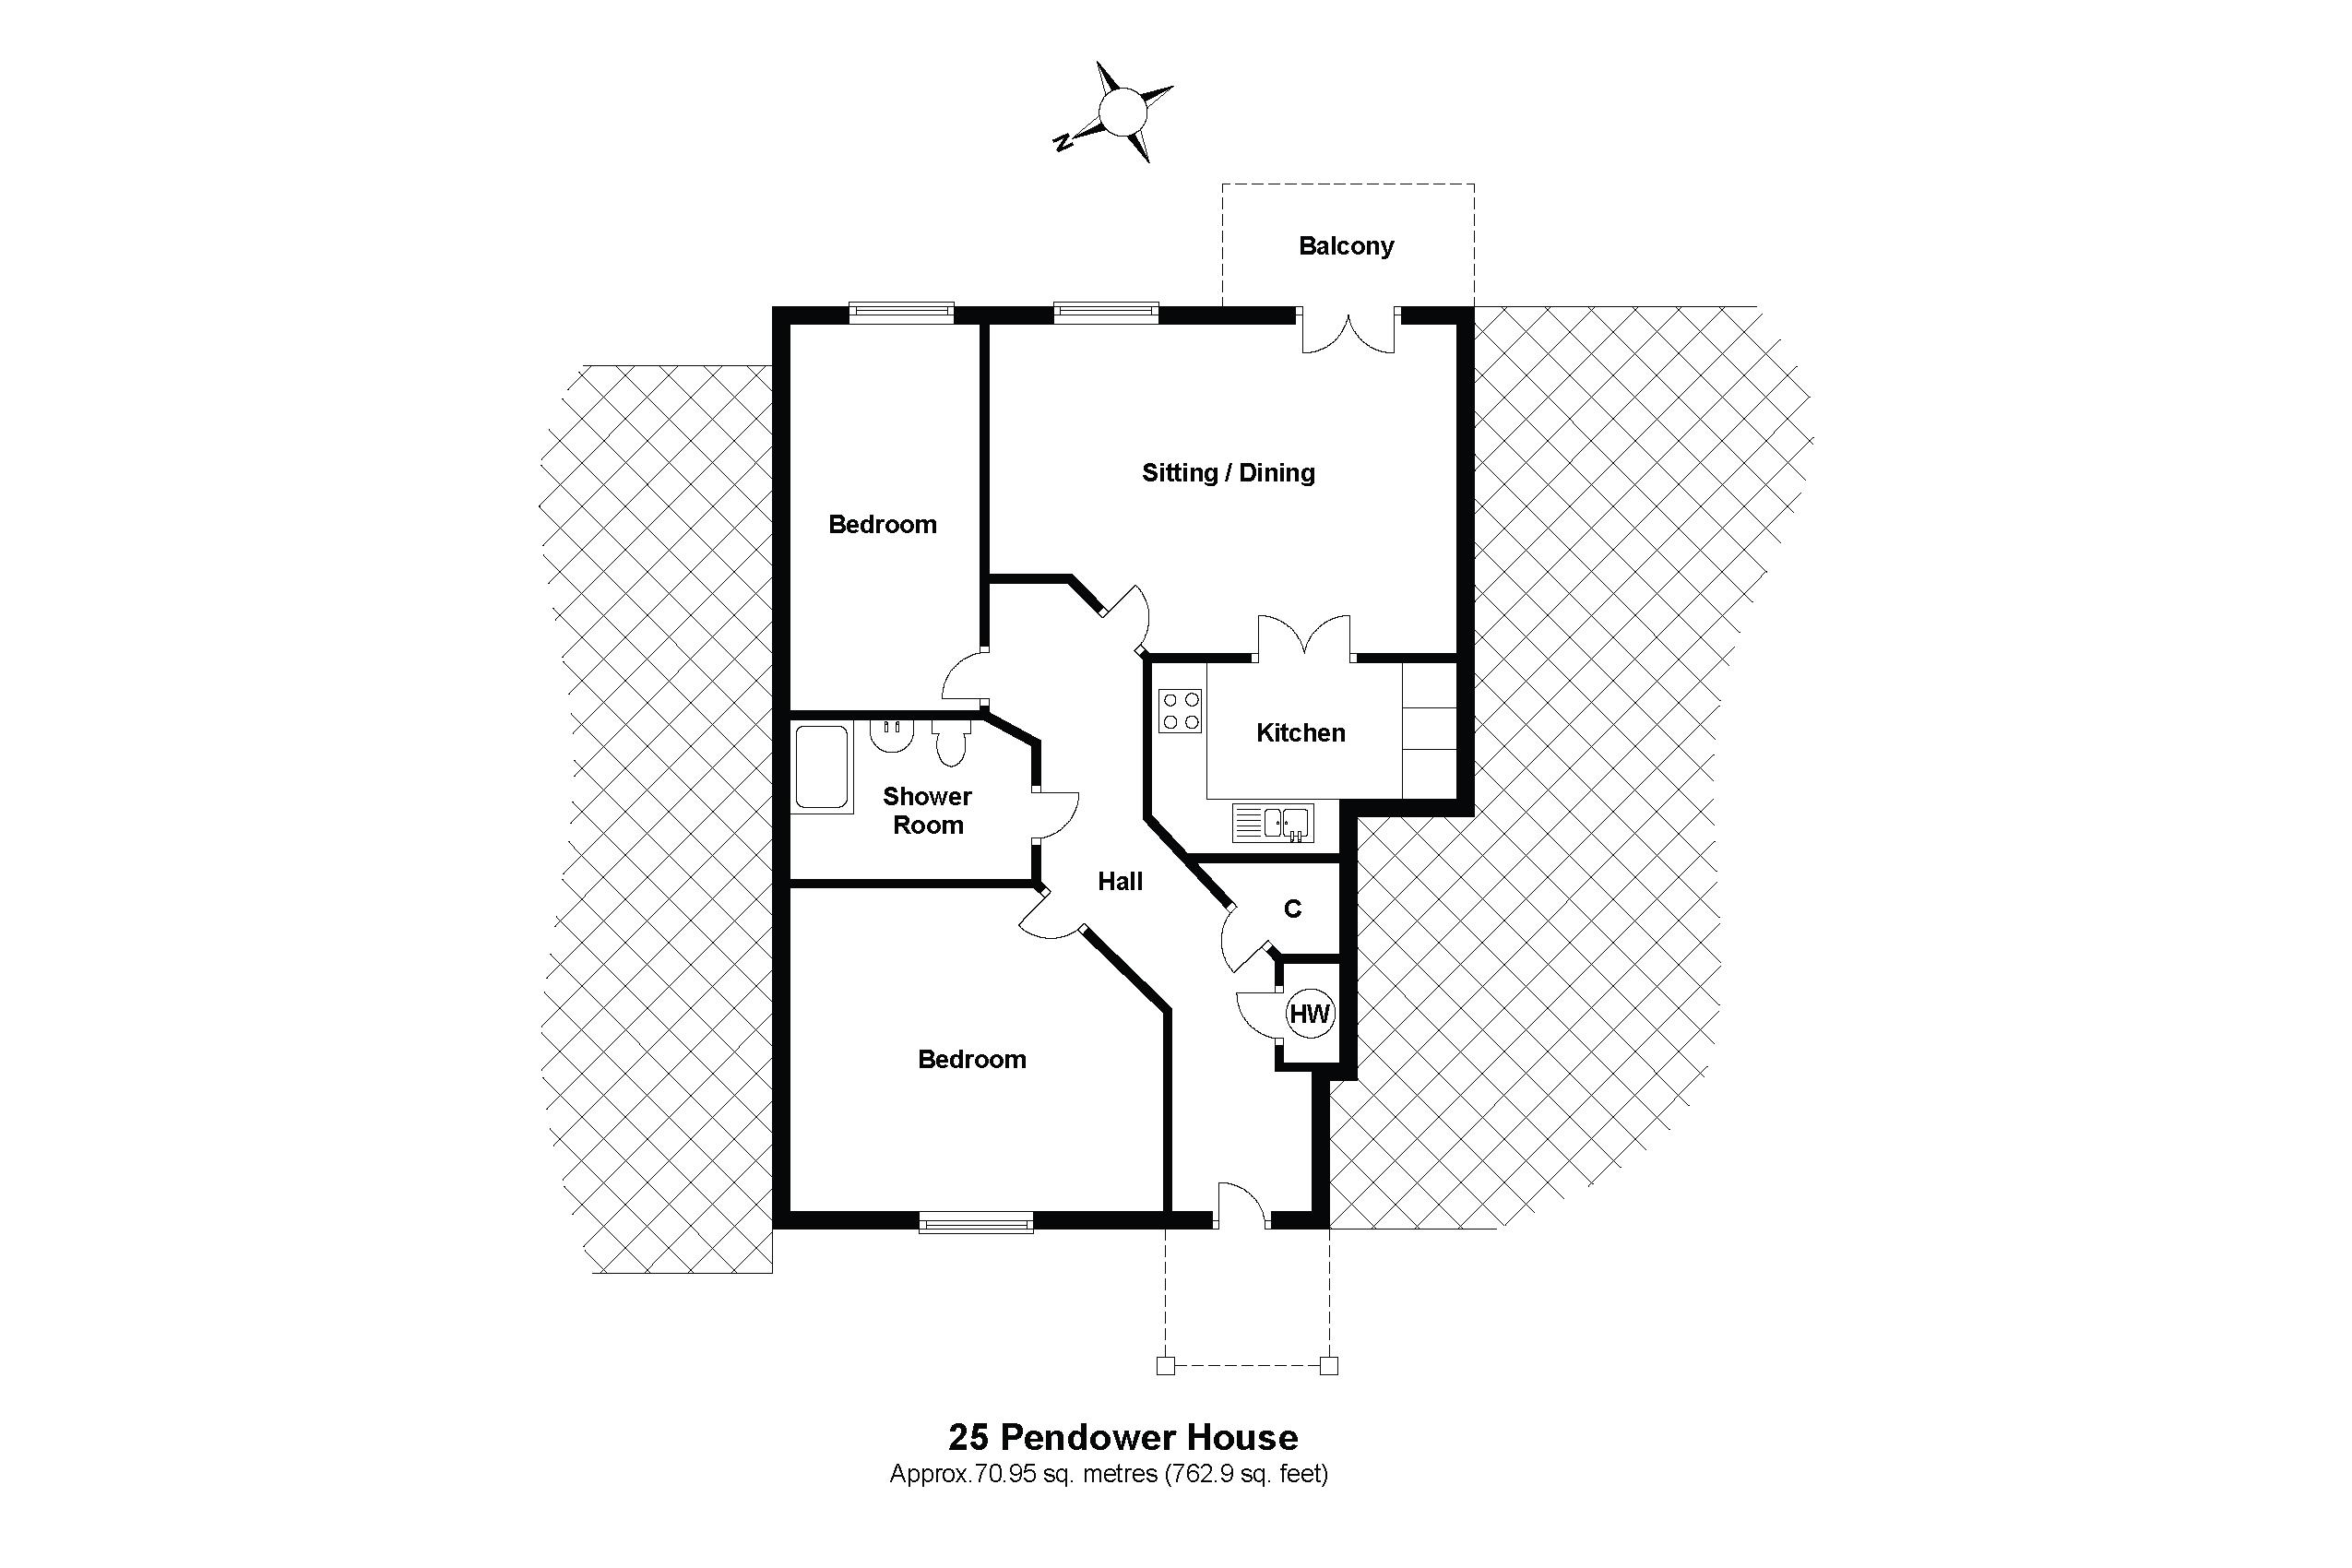 25 Pendower House Floorplan